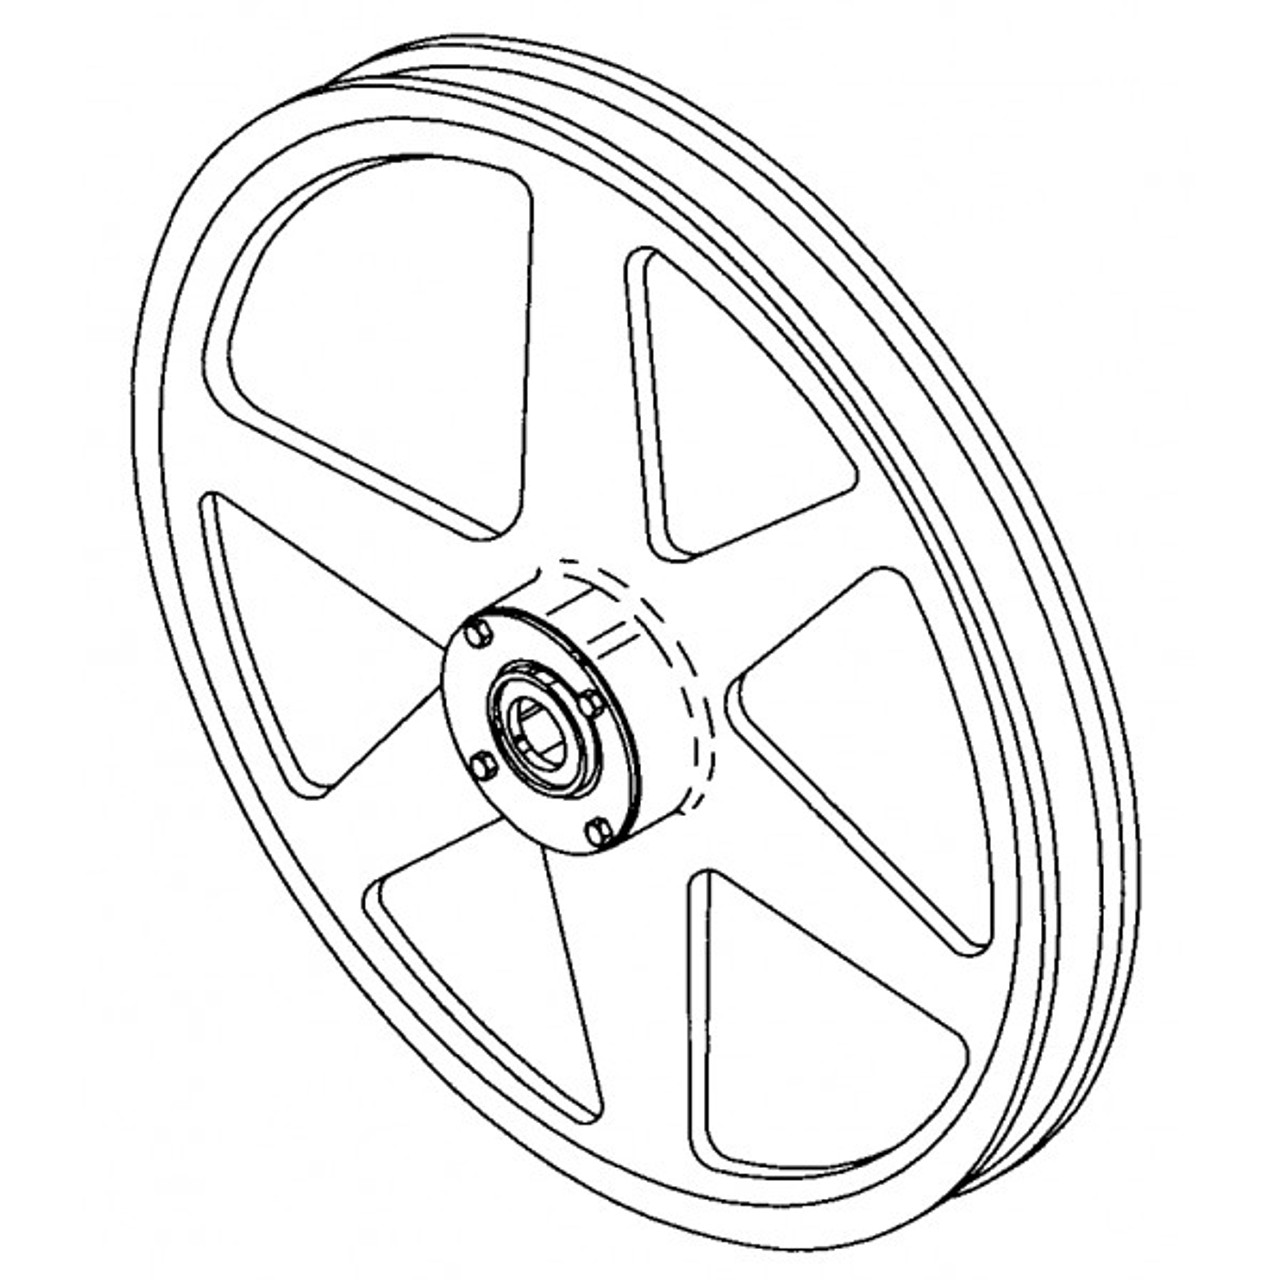 Hobart Saws - Upper Wheel Assembly - Model 6614 - H266A